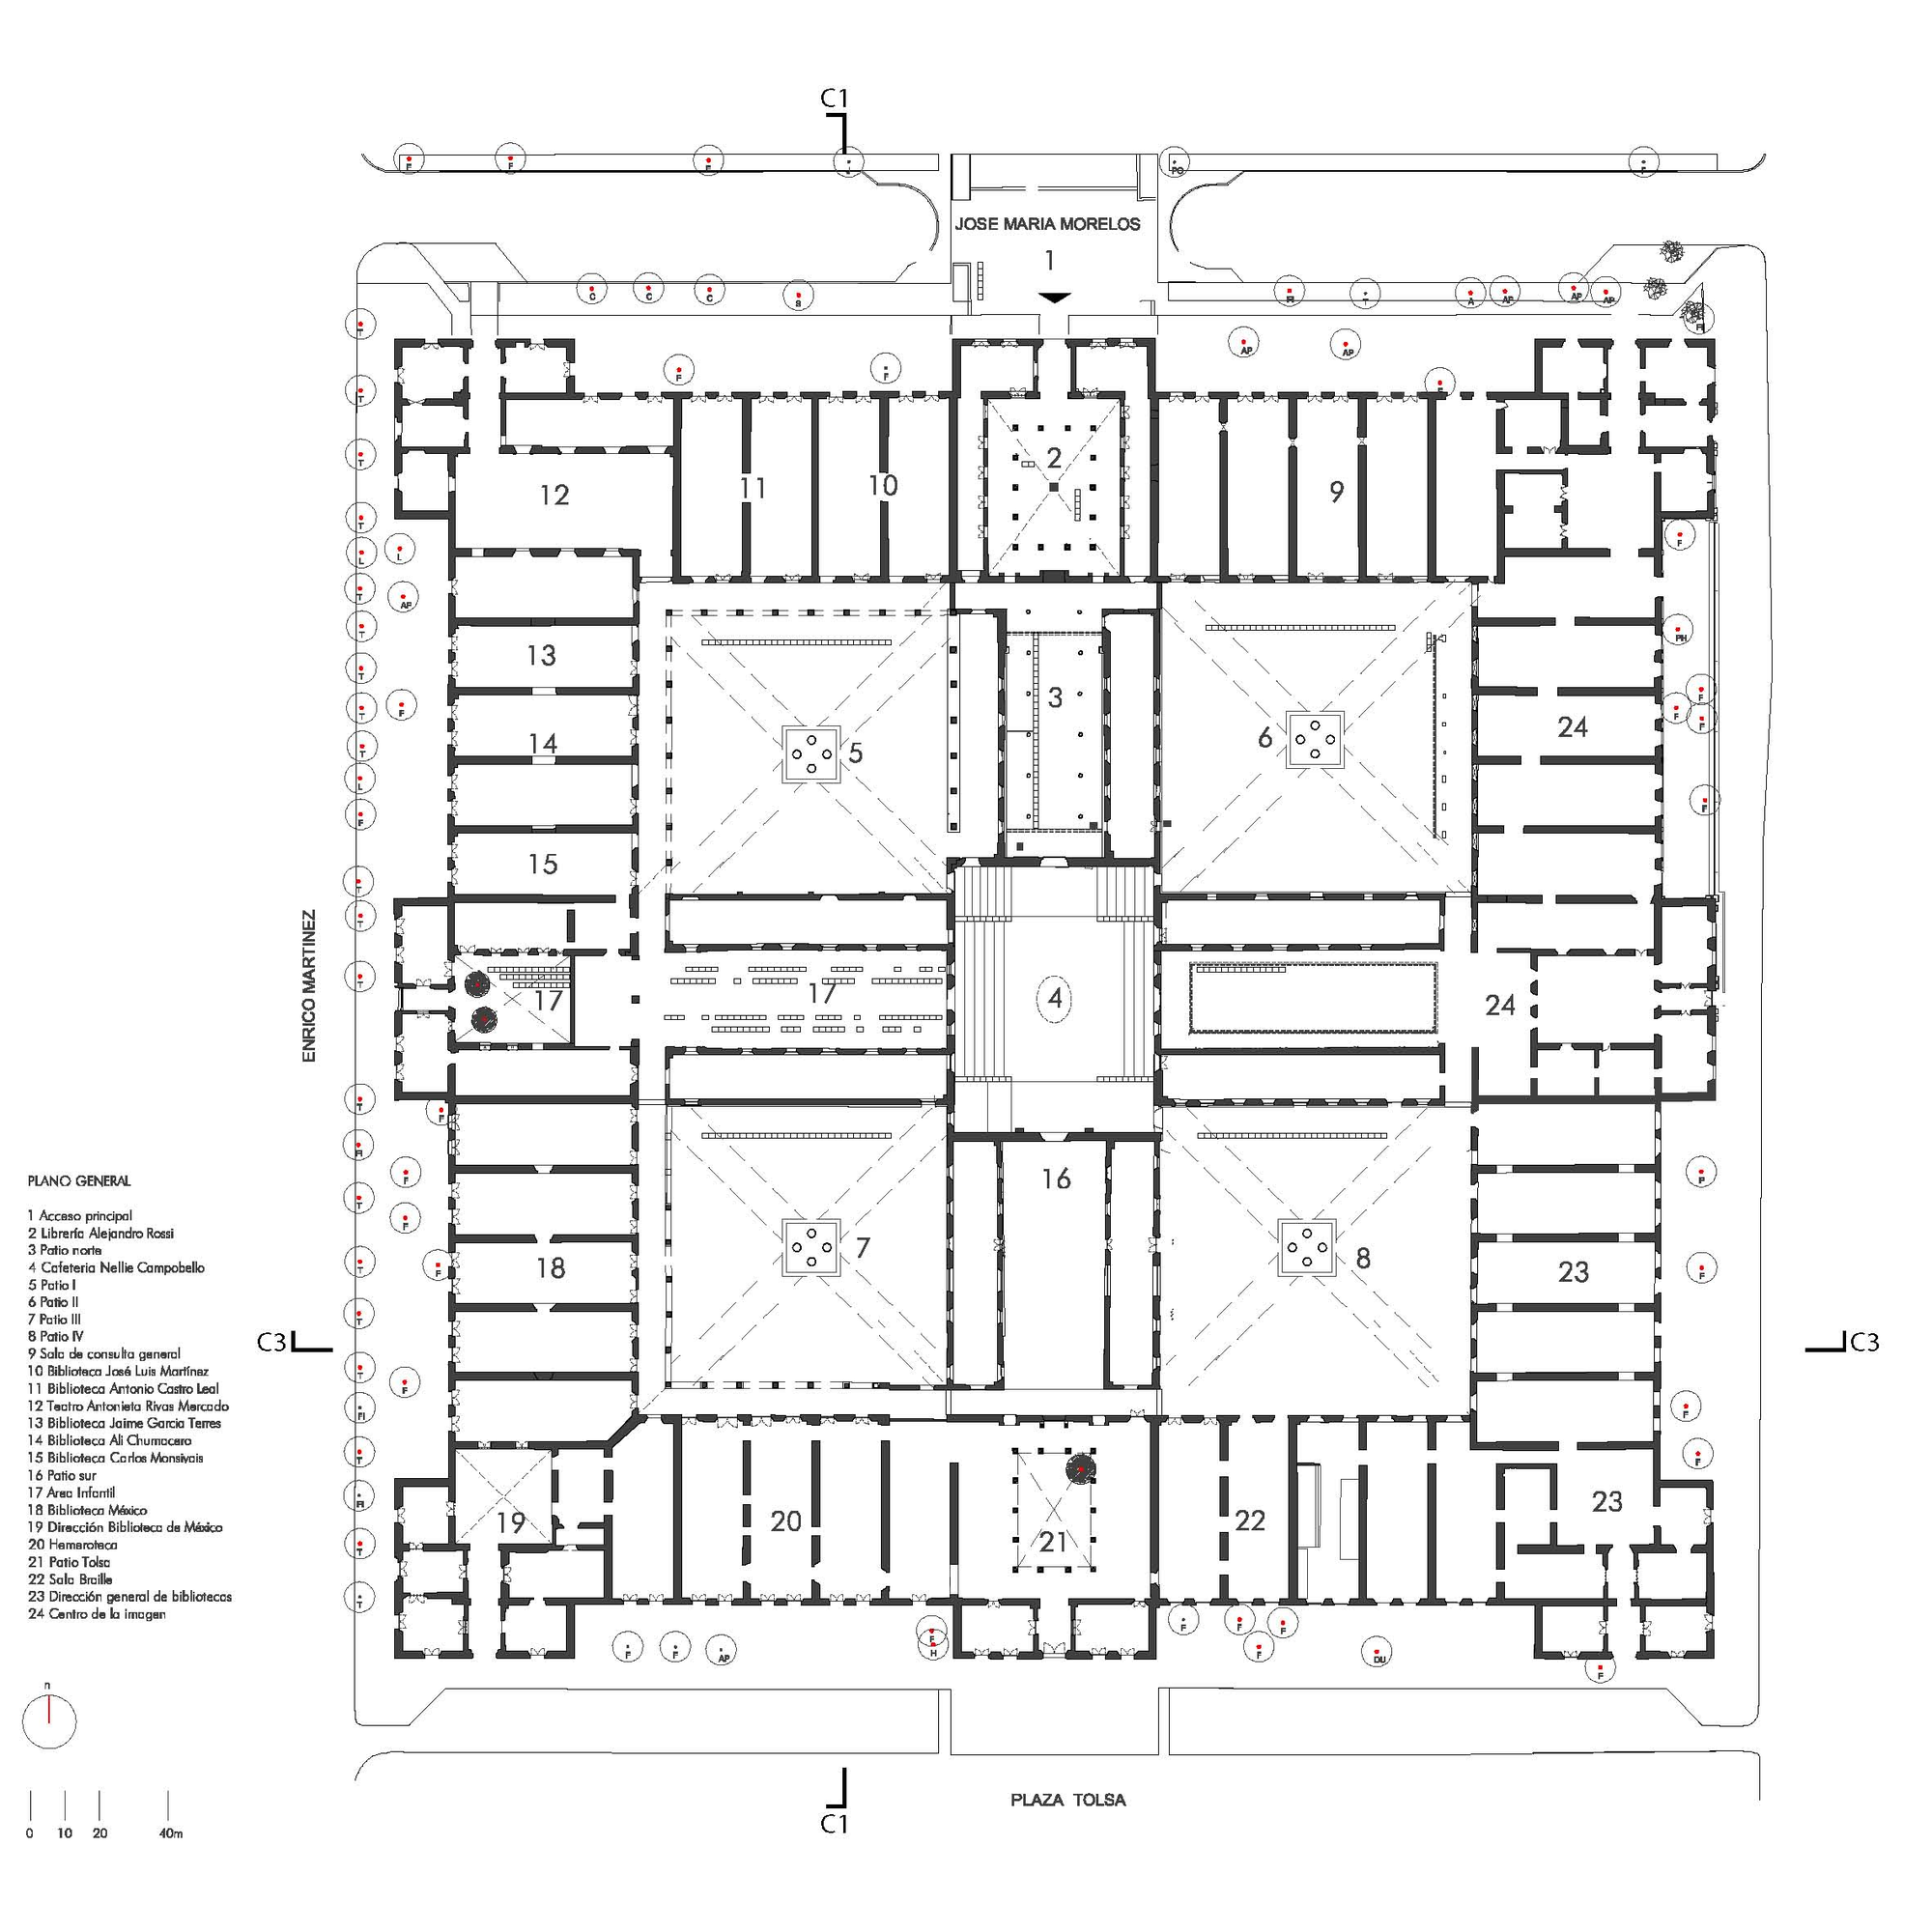 alfa img showing gt jail floor plans modern